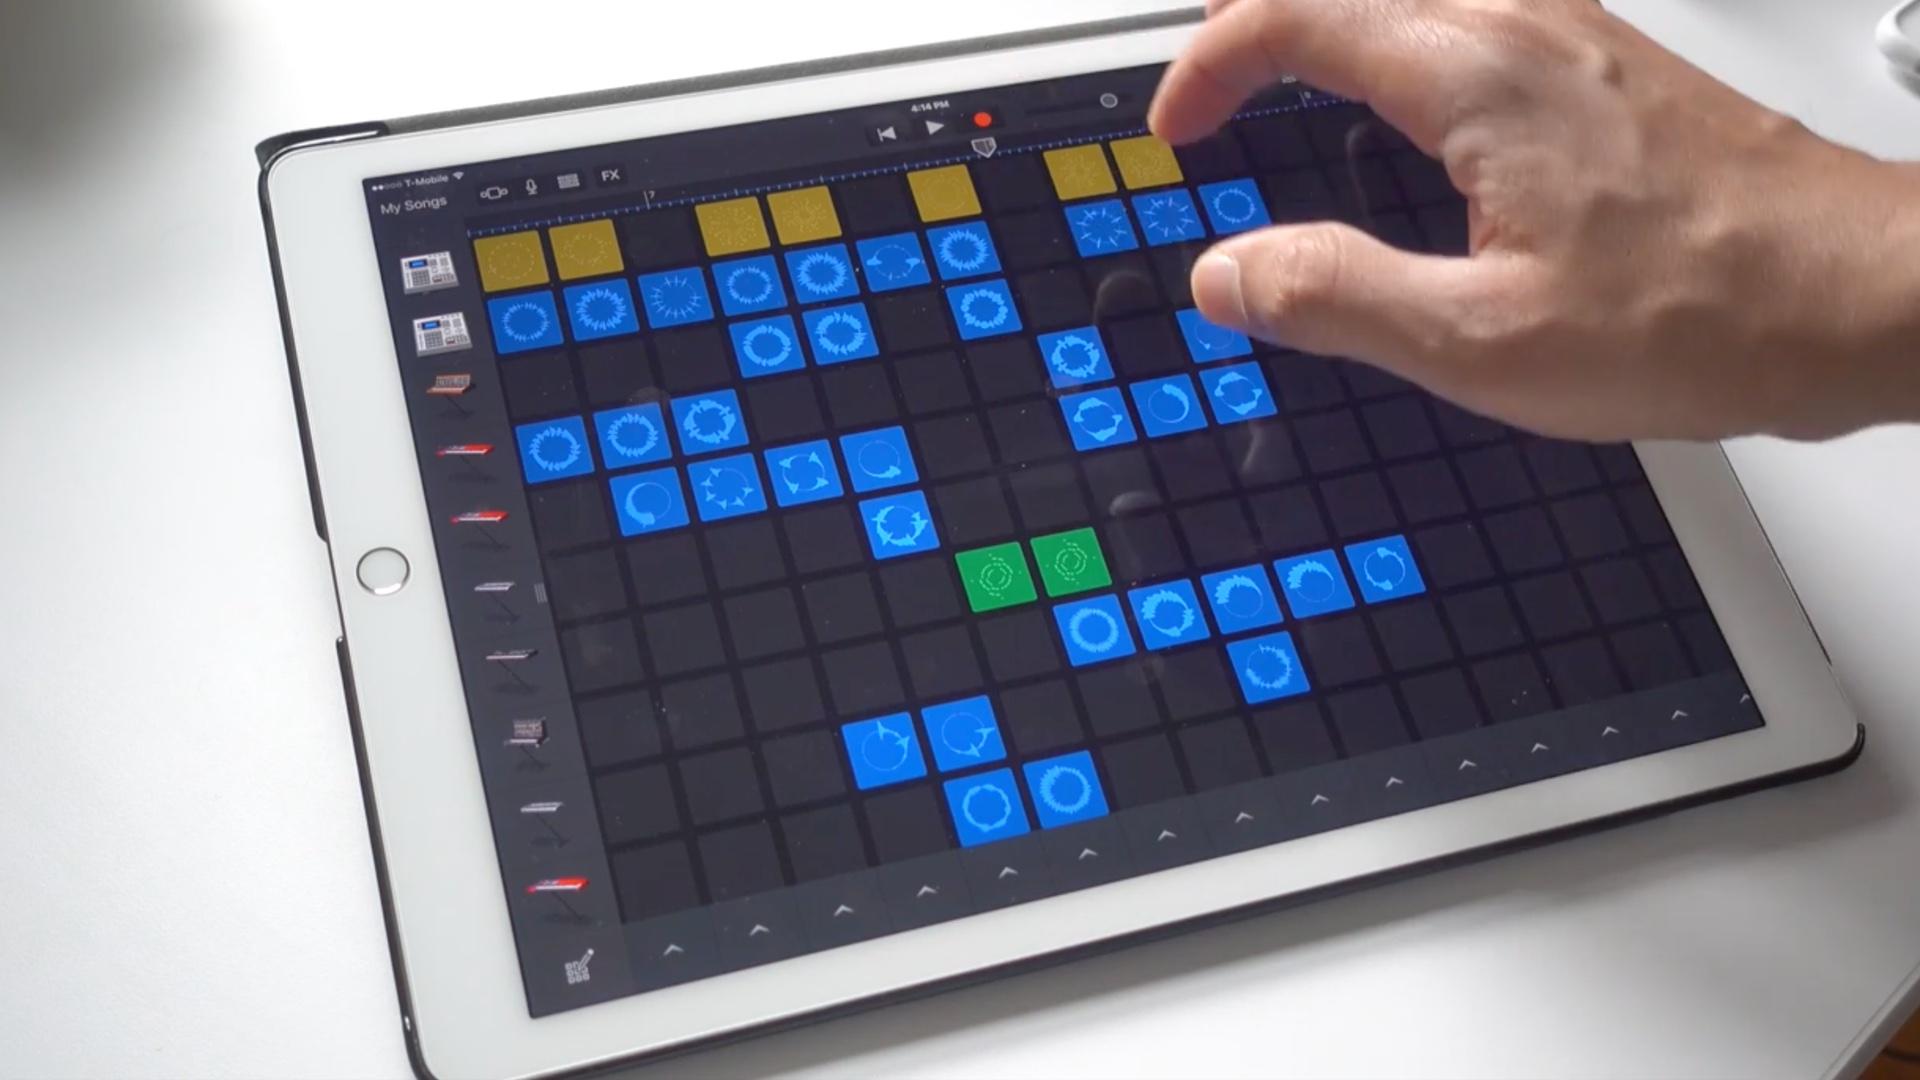 iPad Pro GarageBand